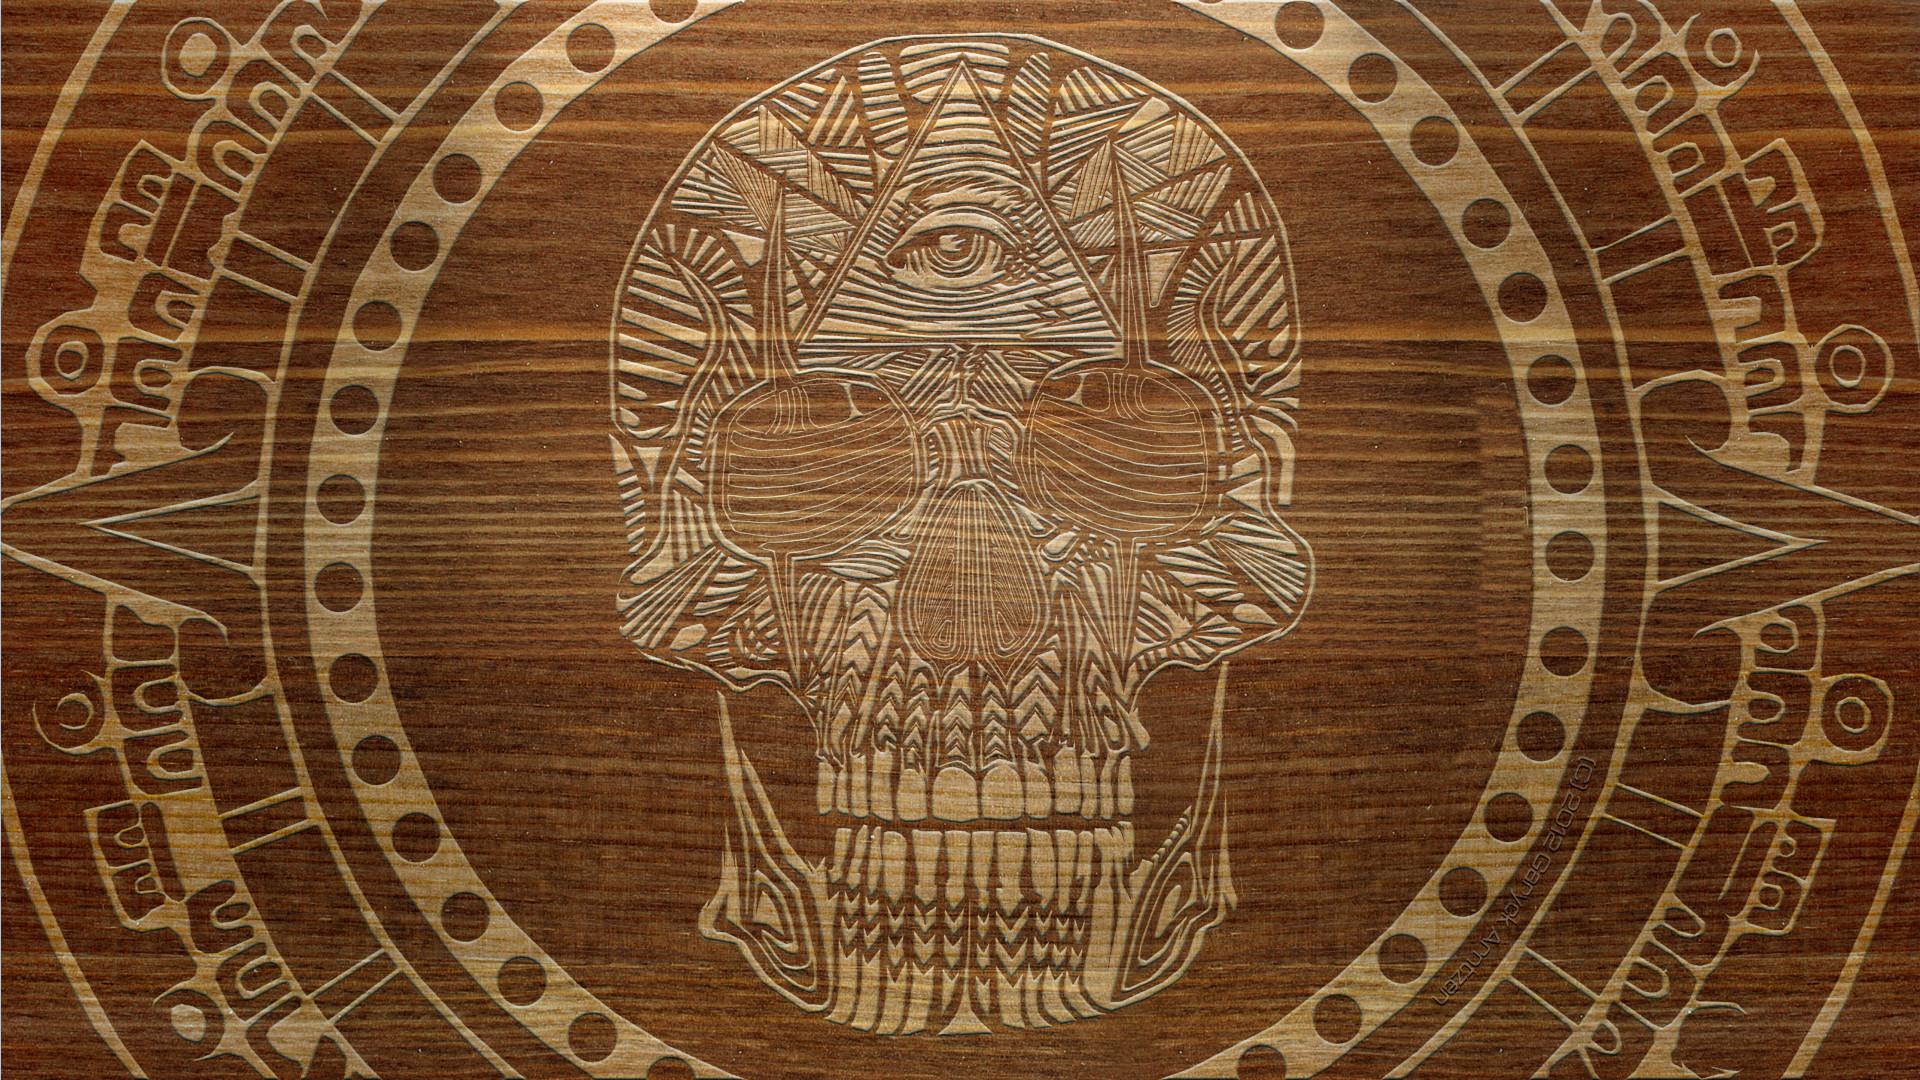 Illuminati 2013 wallpaper